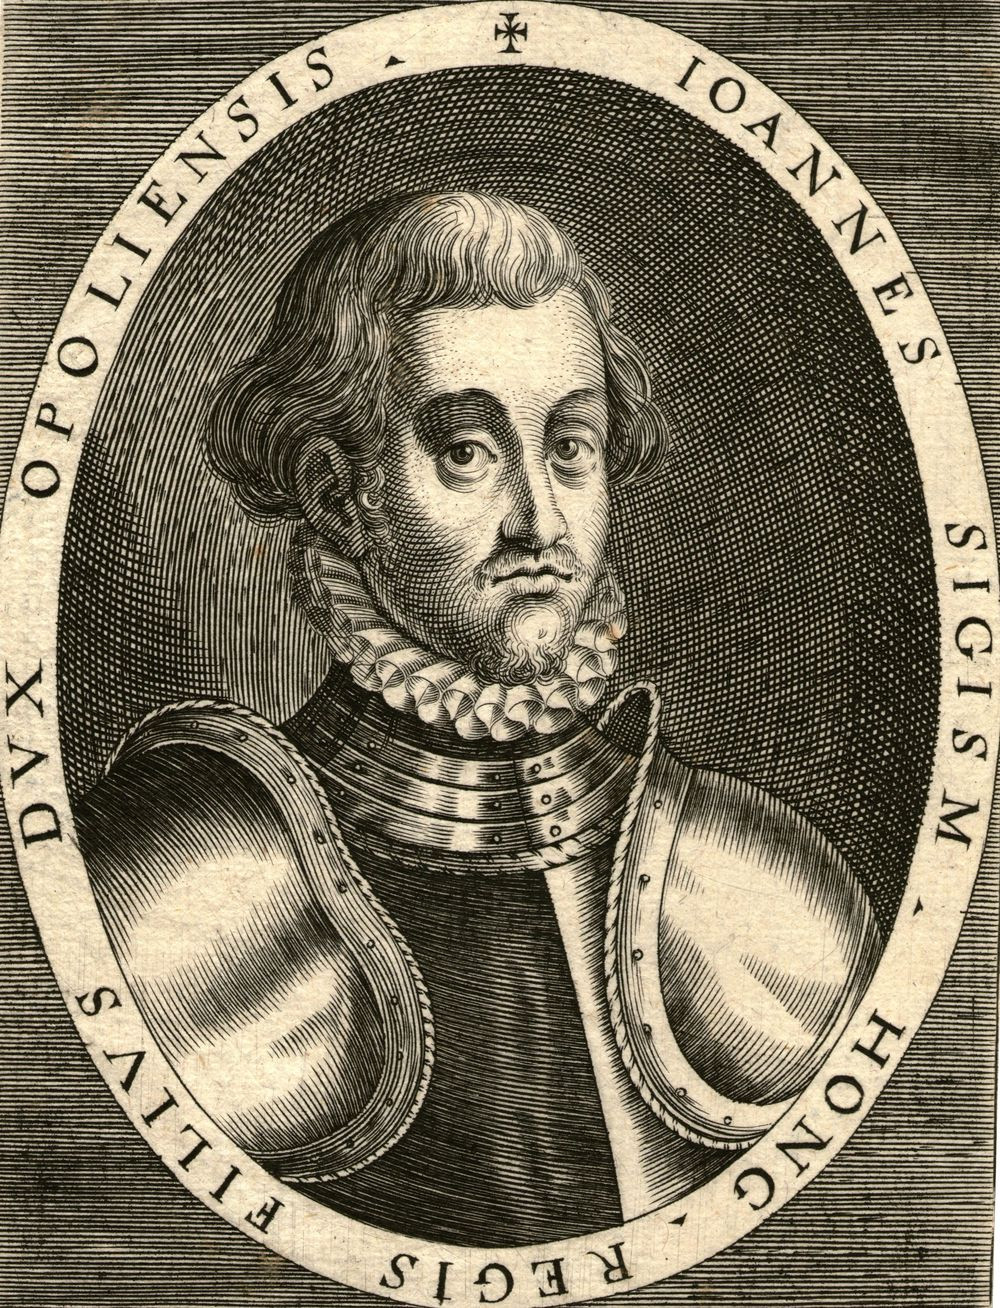 John Sigismund Zápolya, King of Hungary